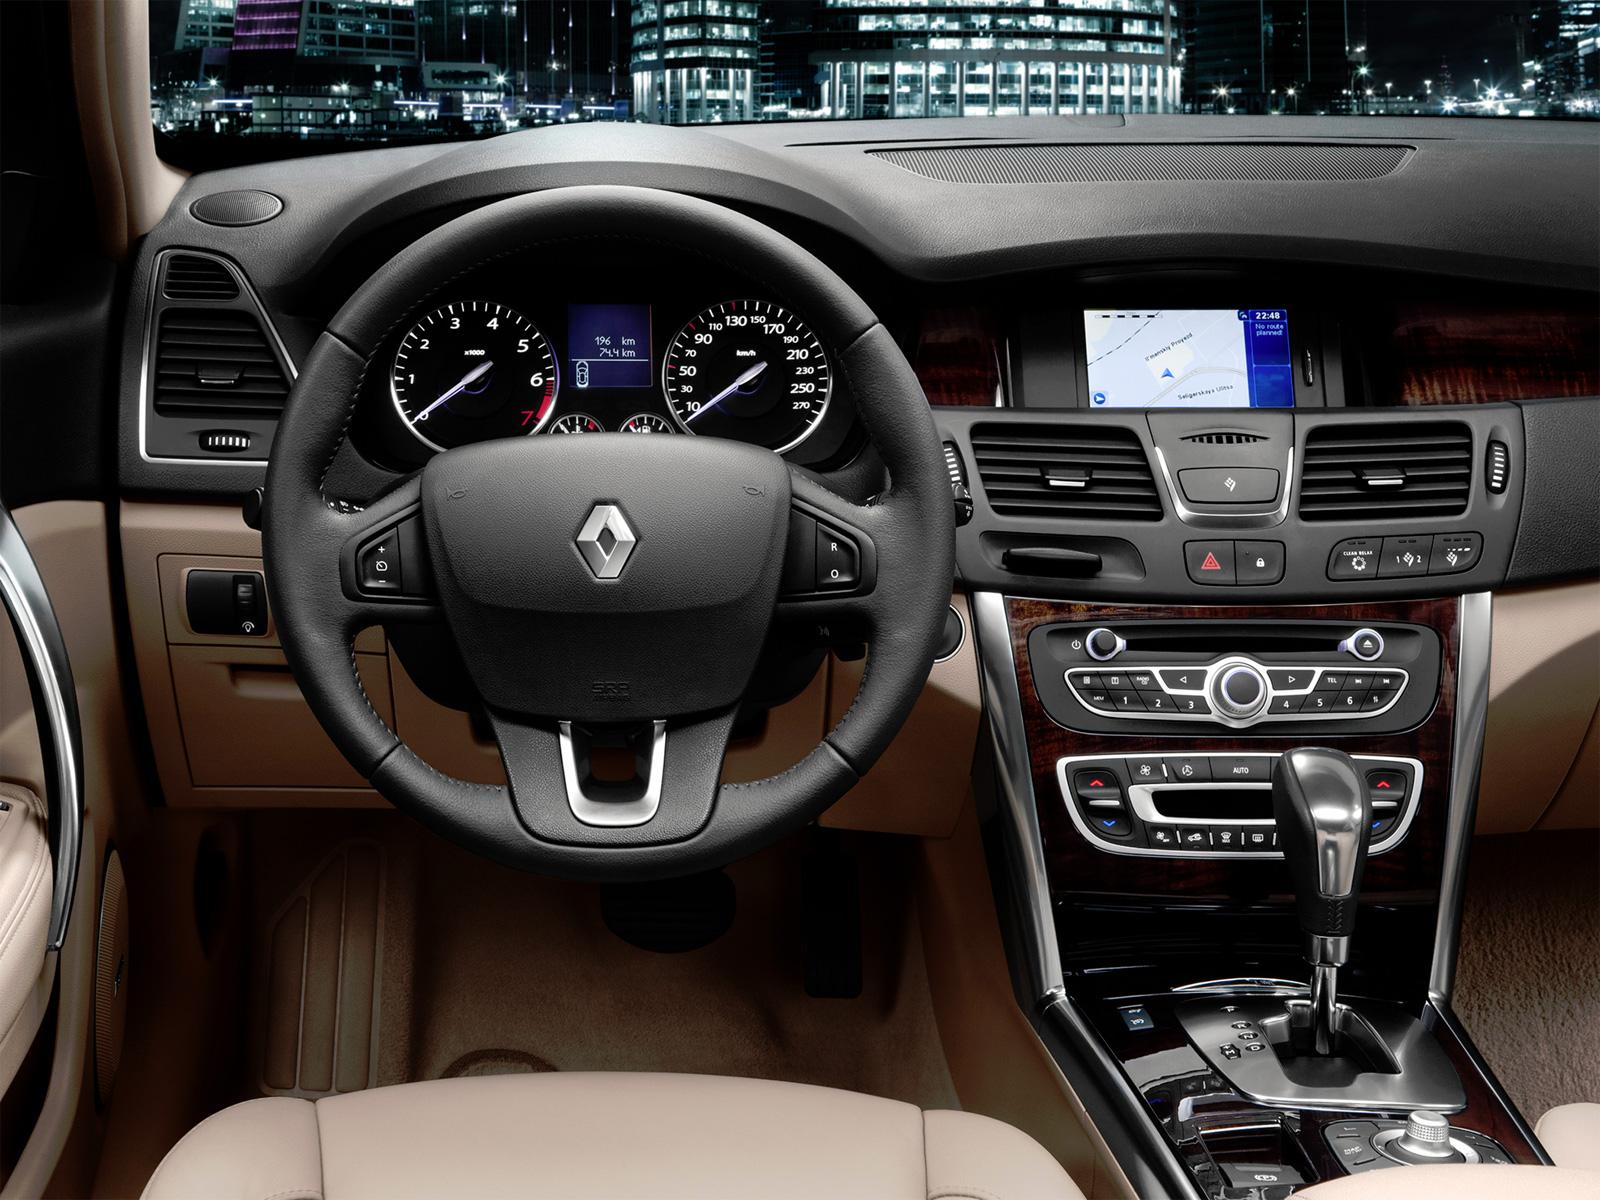 Рестайлинг бизнес-седана Renault Latitude 2014-2015